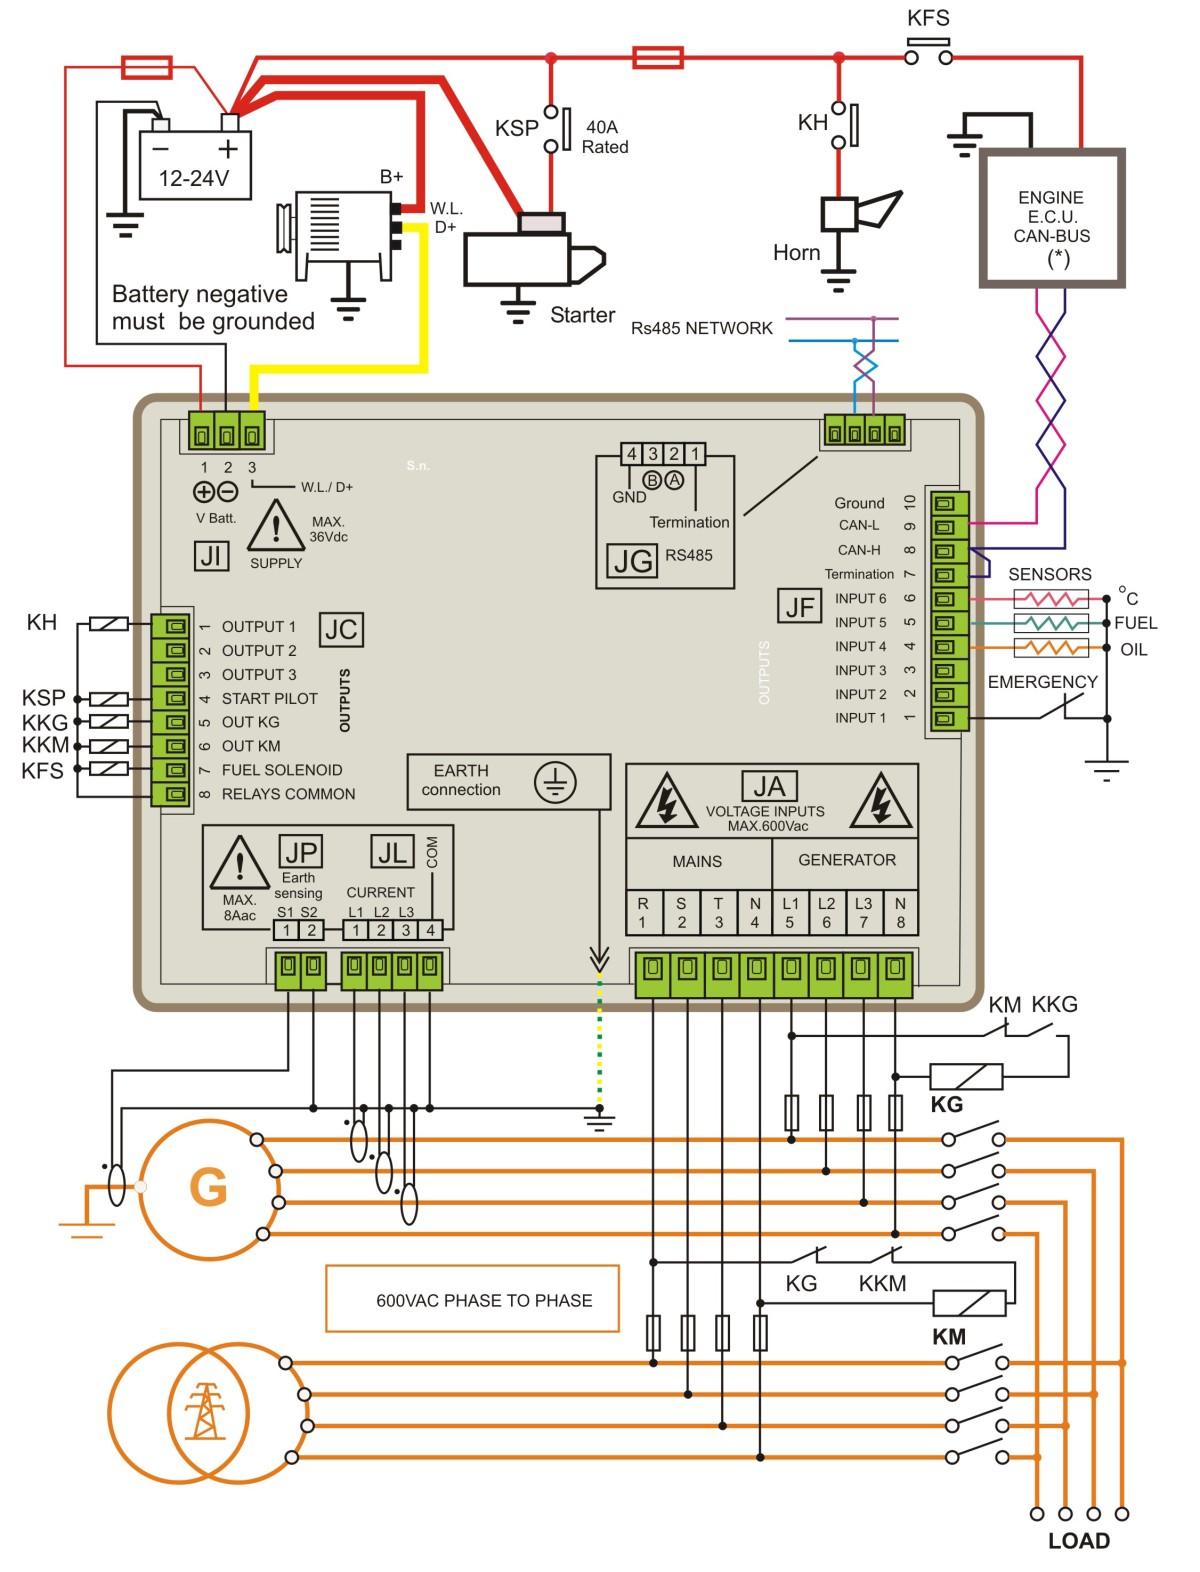 Sensational Wiring Diagram Ats Amf Wiring Diagram G9 Wiring Cloud Ittabisraaidewilluminateatxorg